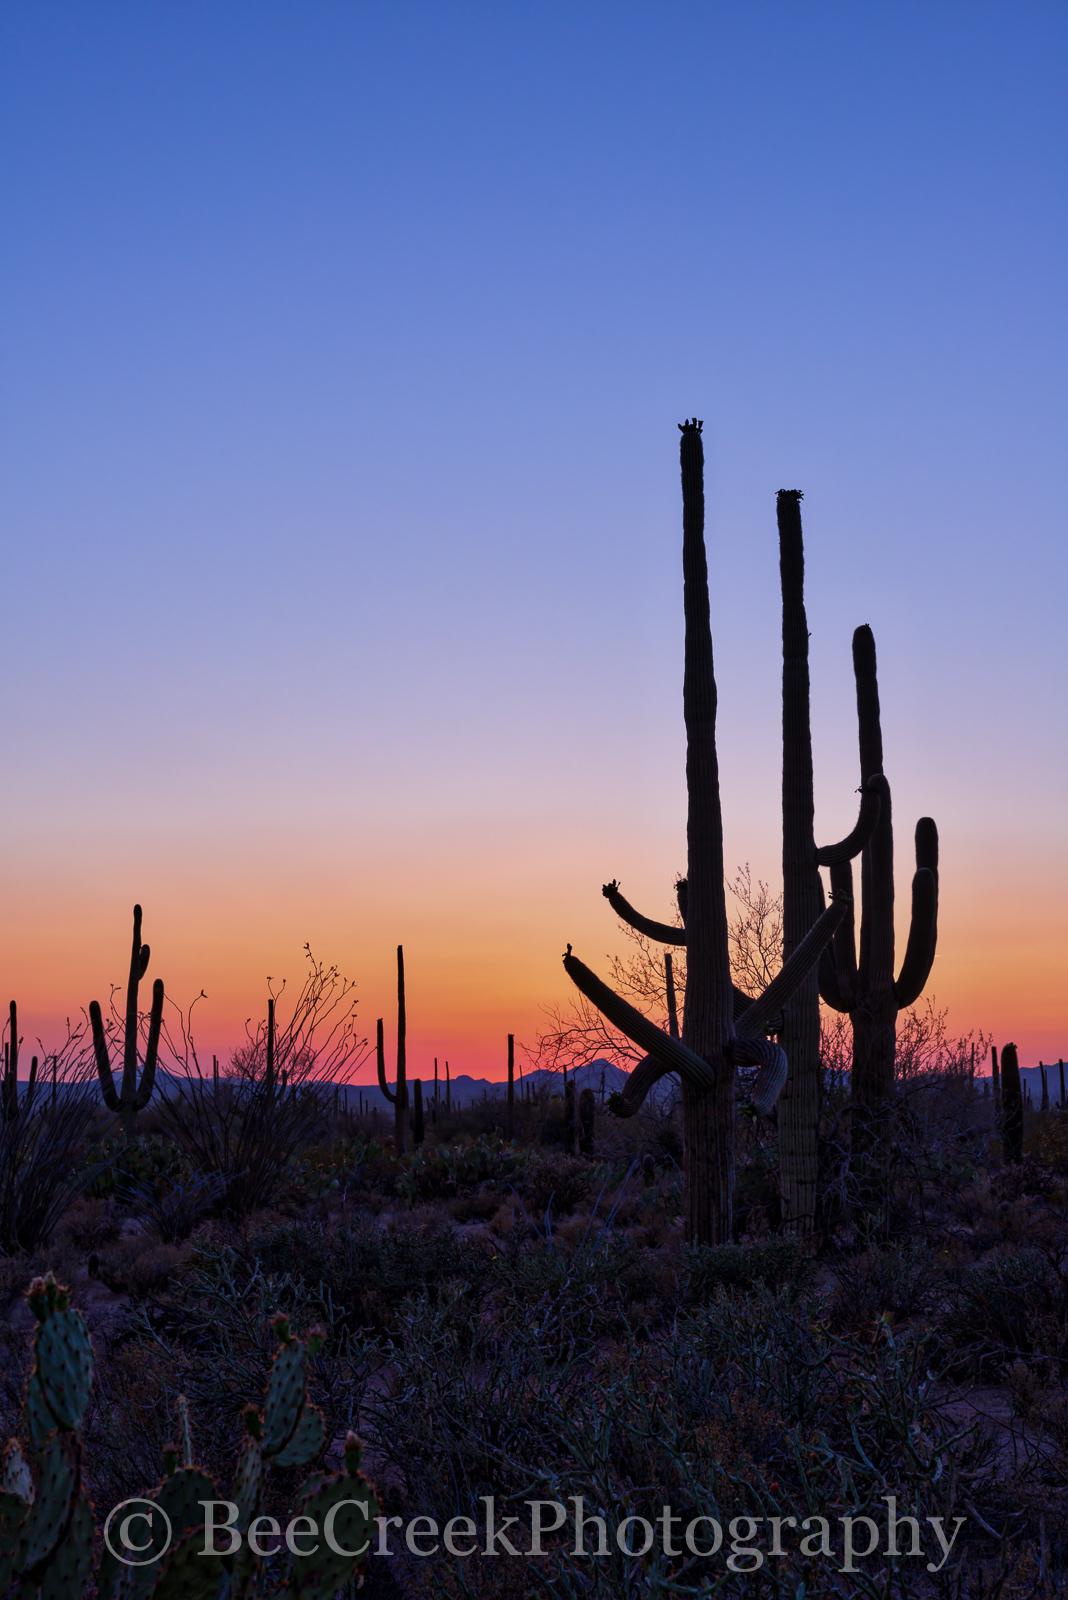 tucson, saguaro cactus, cactus, cact, sunset, arrzona sunset, az sunset, desert, beecreekphoto, landscape, landscapes, tucson cati, tucson flora, desert, images of tucson, photographs of tucson, tucso, photo